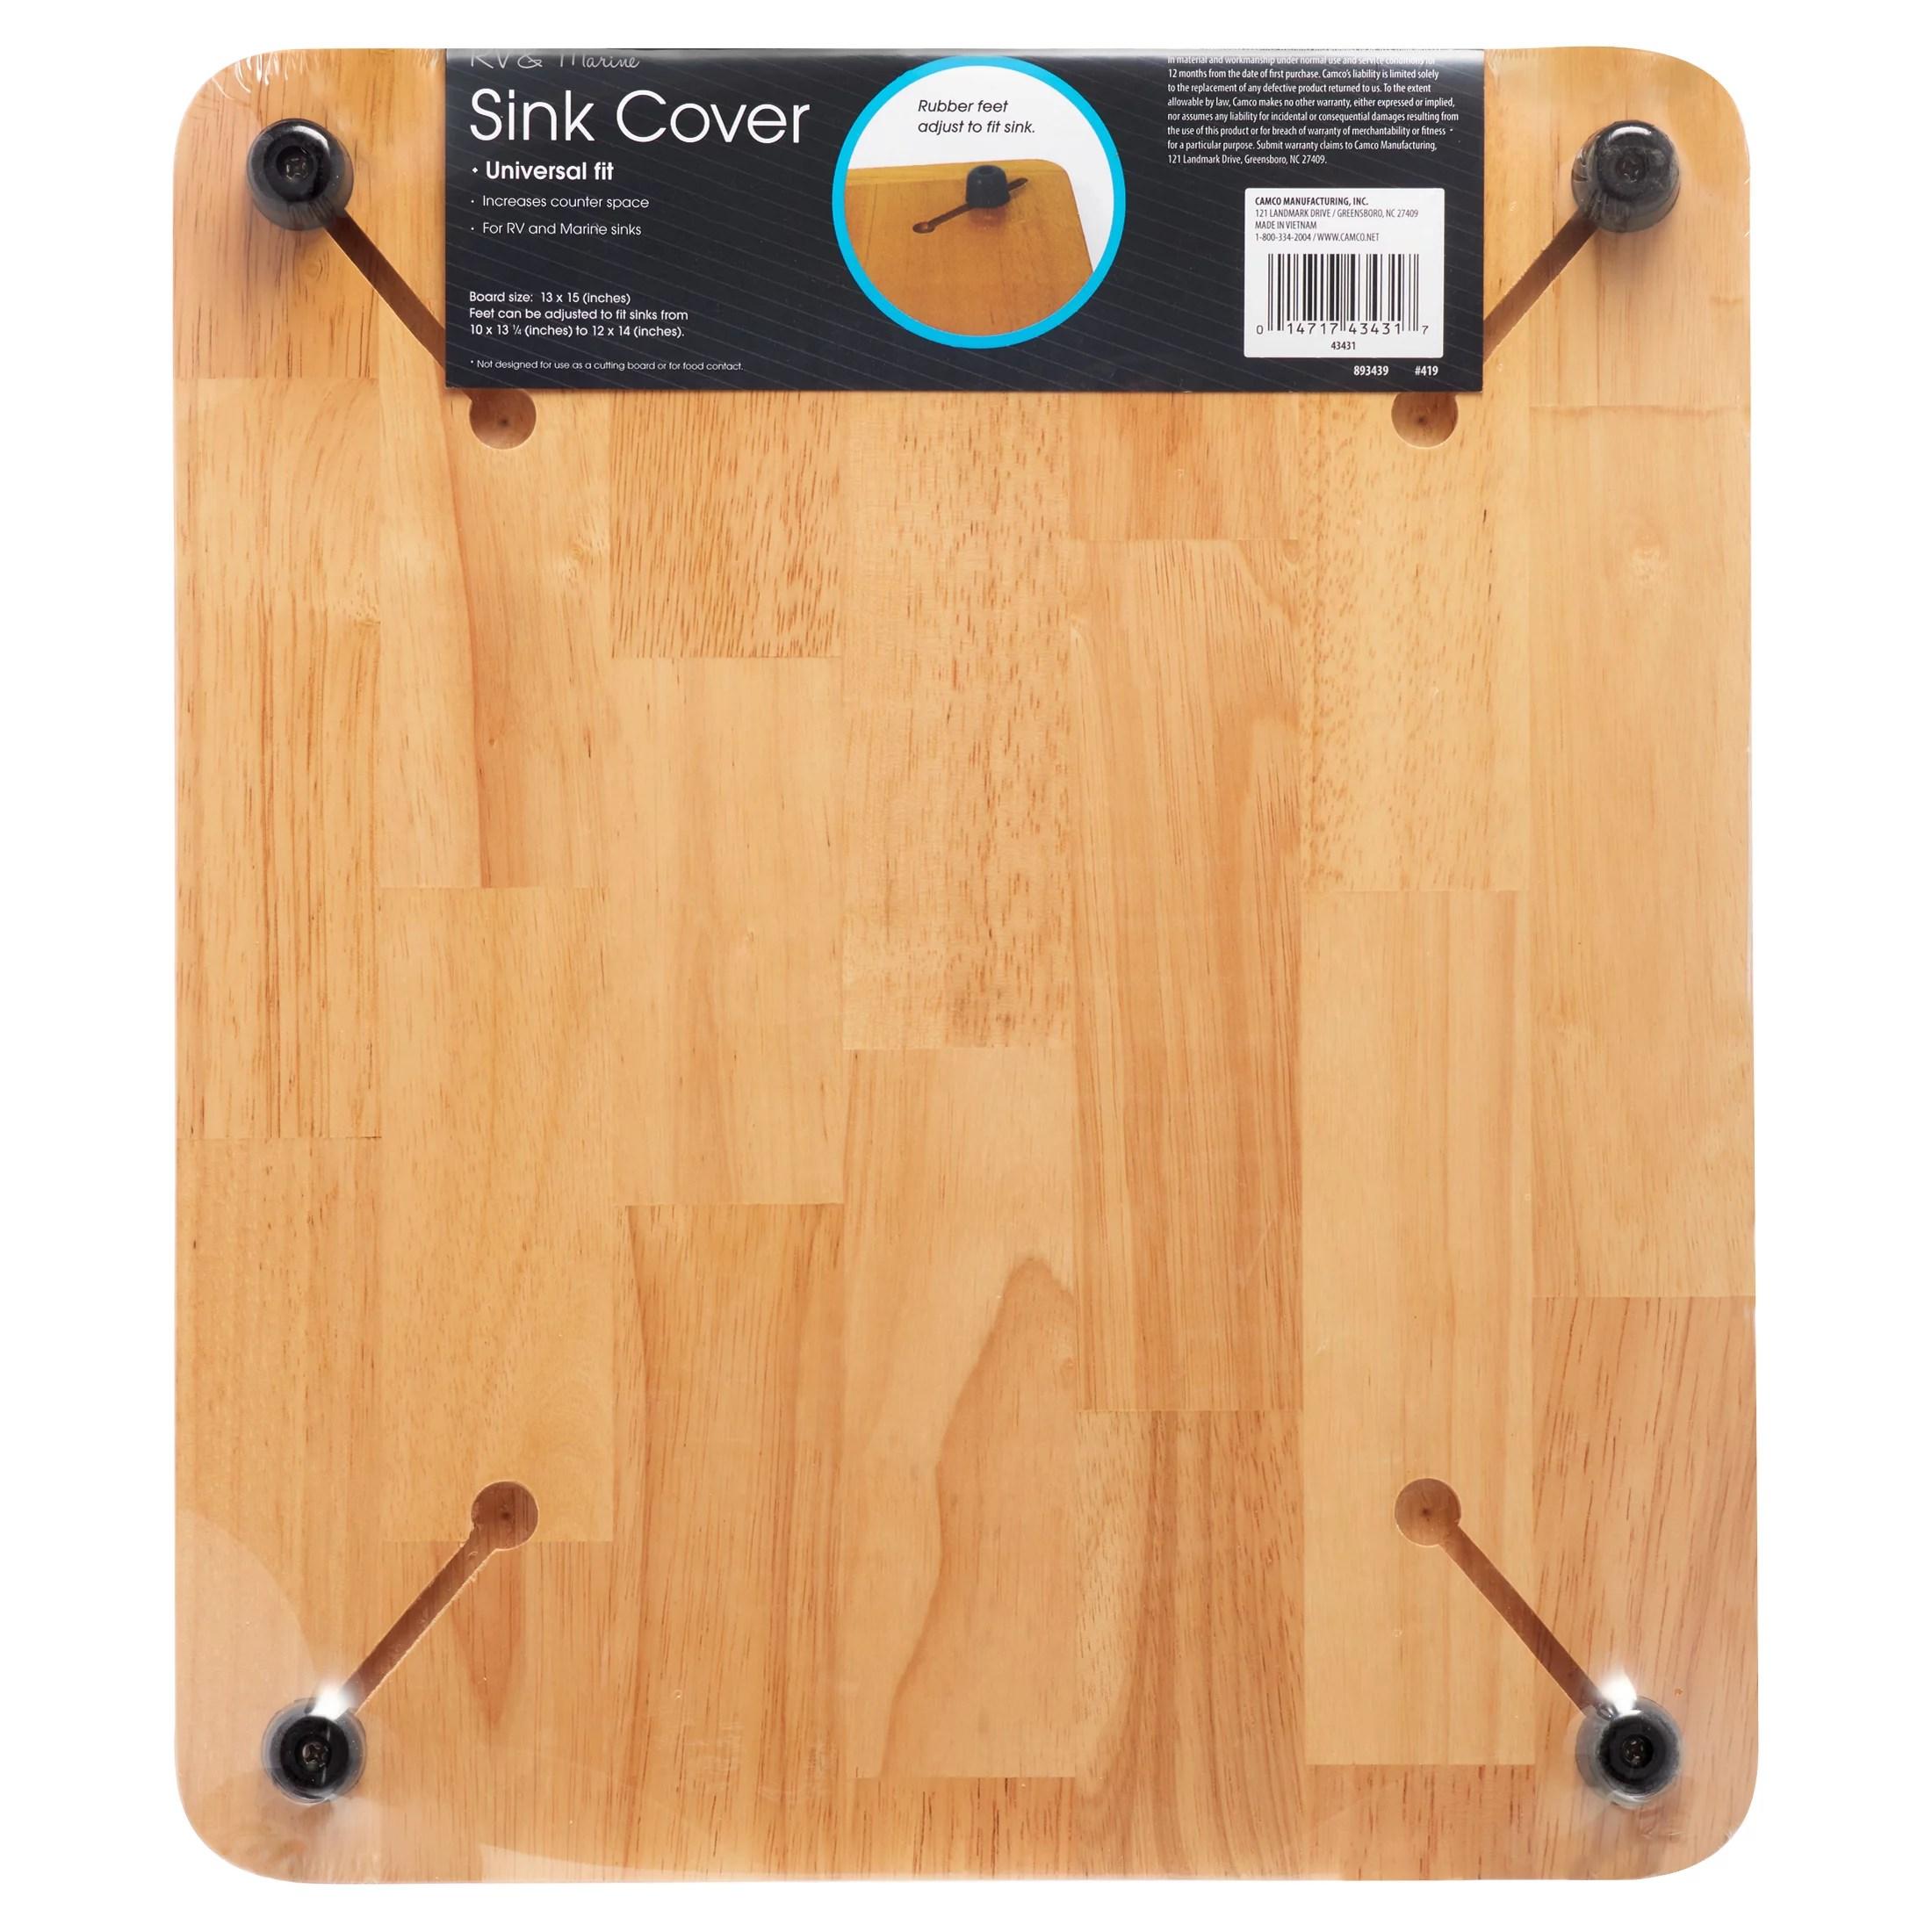 oak accents sink cover 13in x 15in